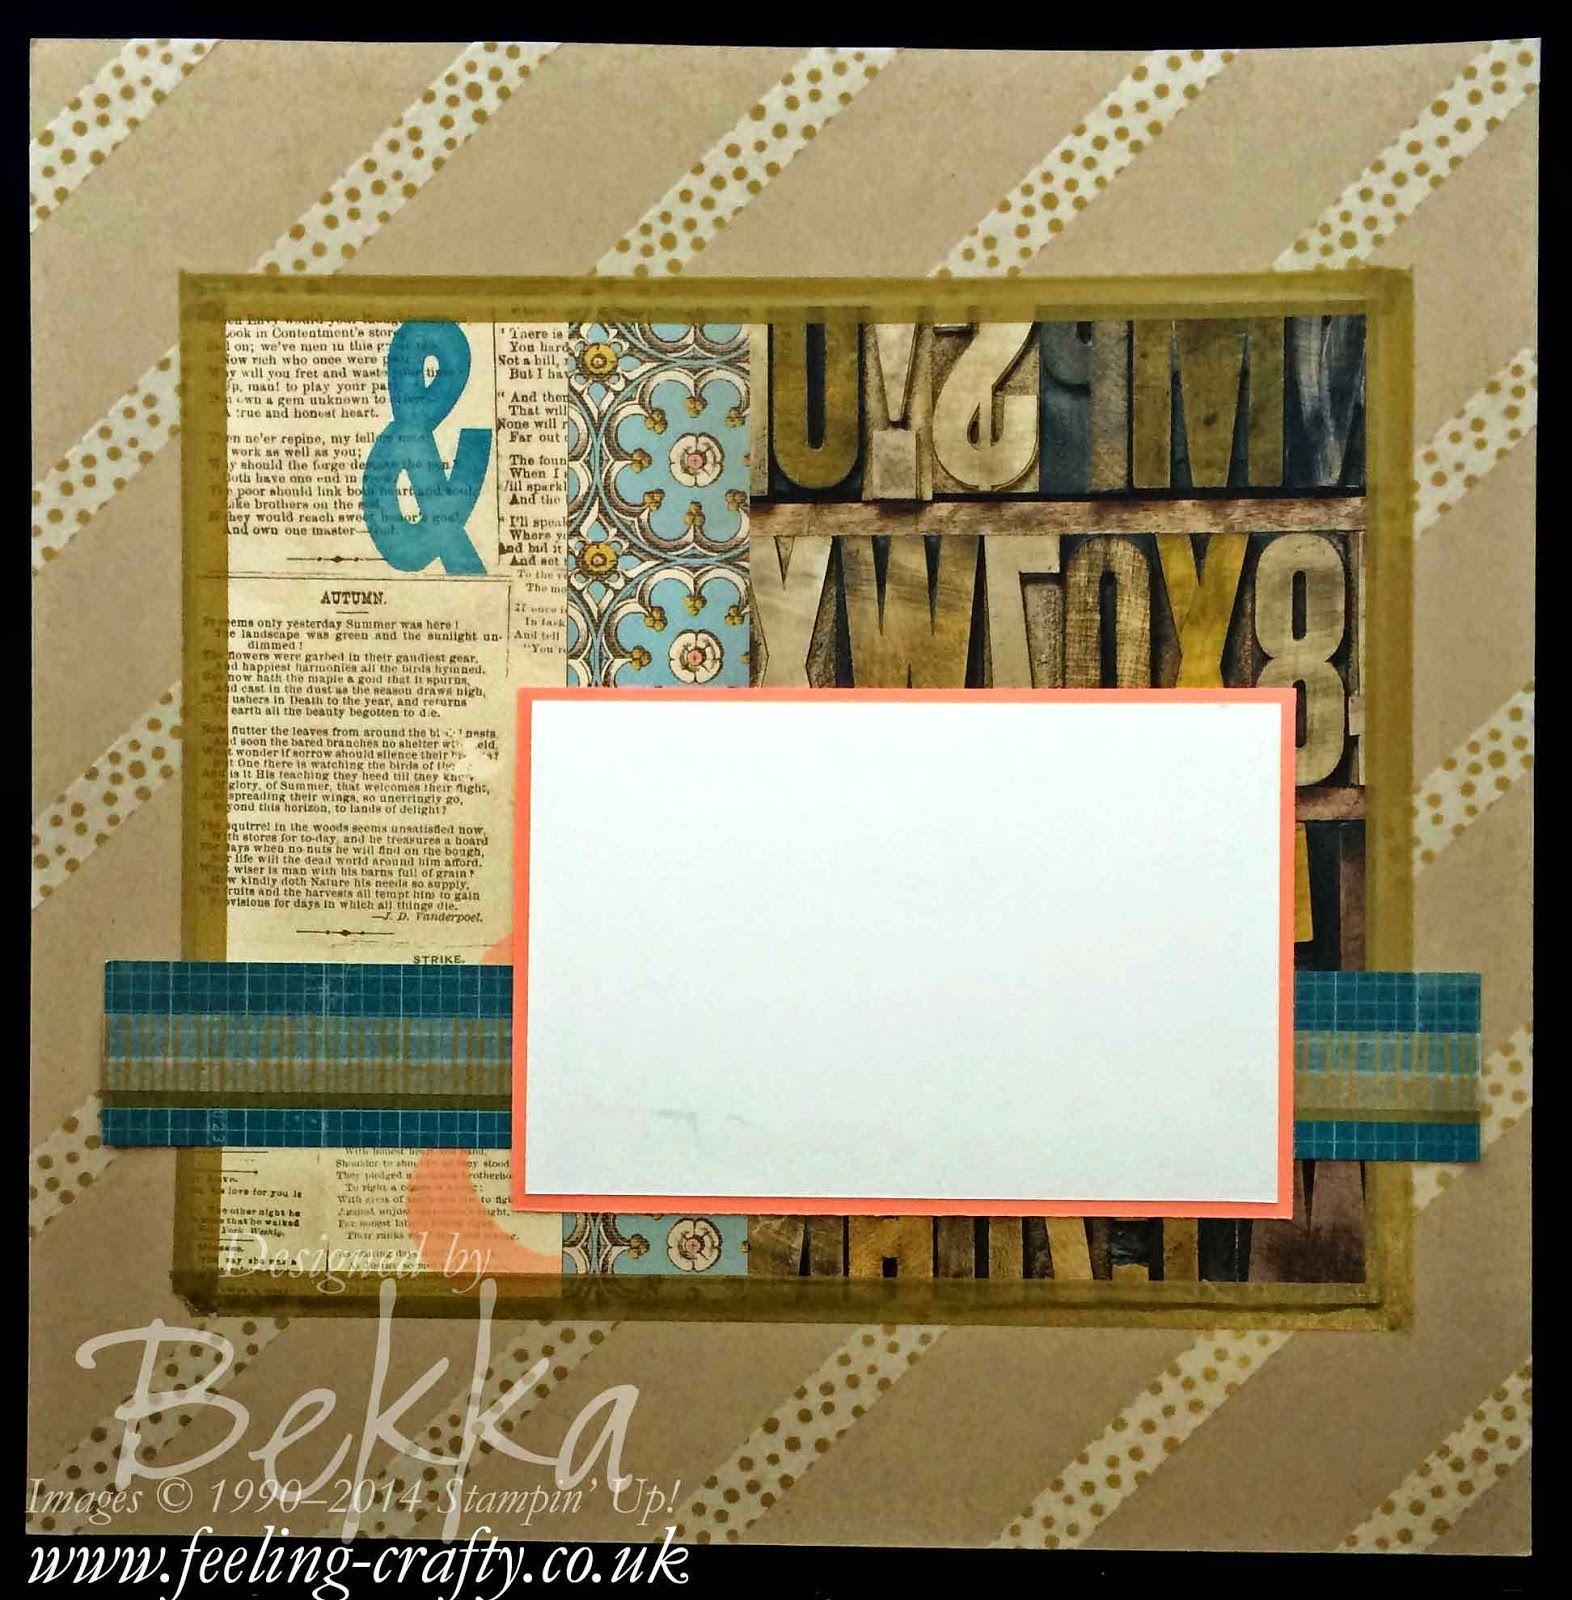 How to scrapbook uk - Washi Tape Fun Scrapbook Page By Stampin Up Uk Independent Demonstrator Bekka Check